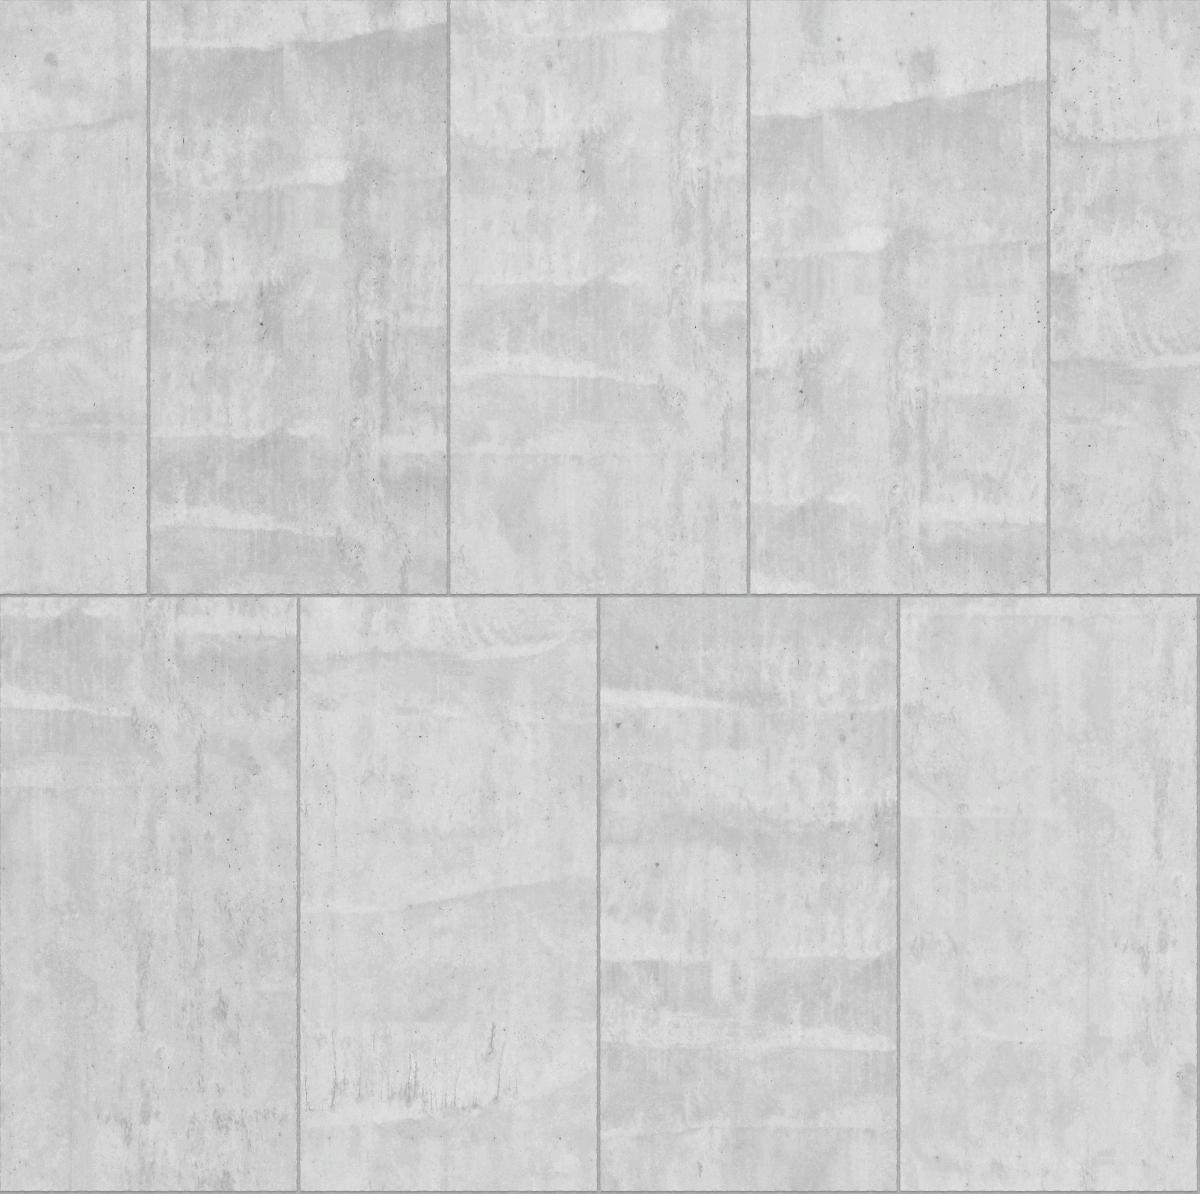 A seamless concrete texture with in situ concrete blocks arranged in a stretcher pattern